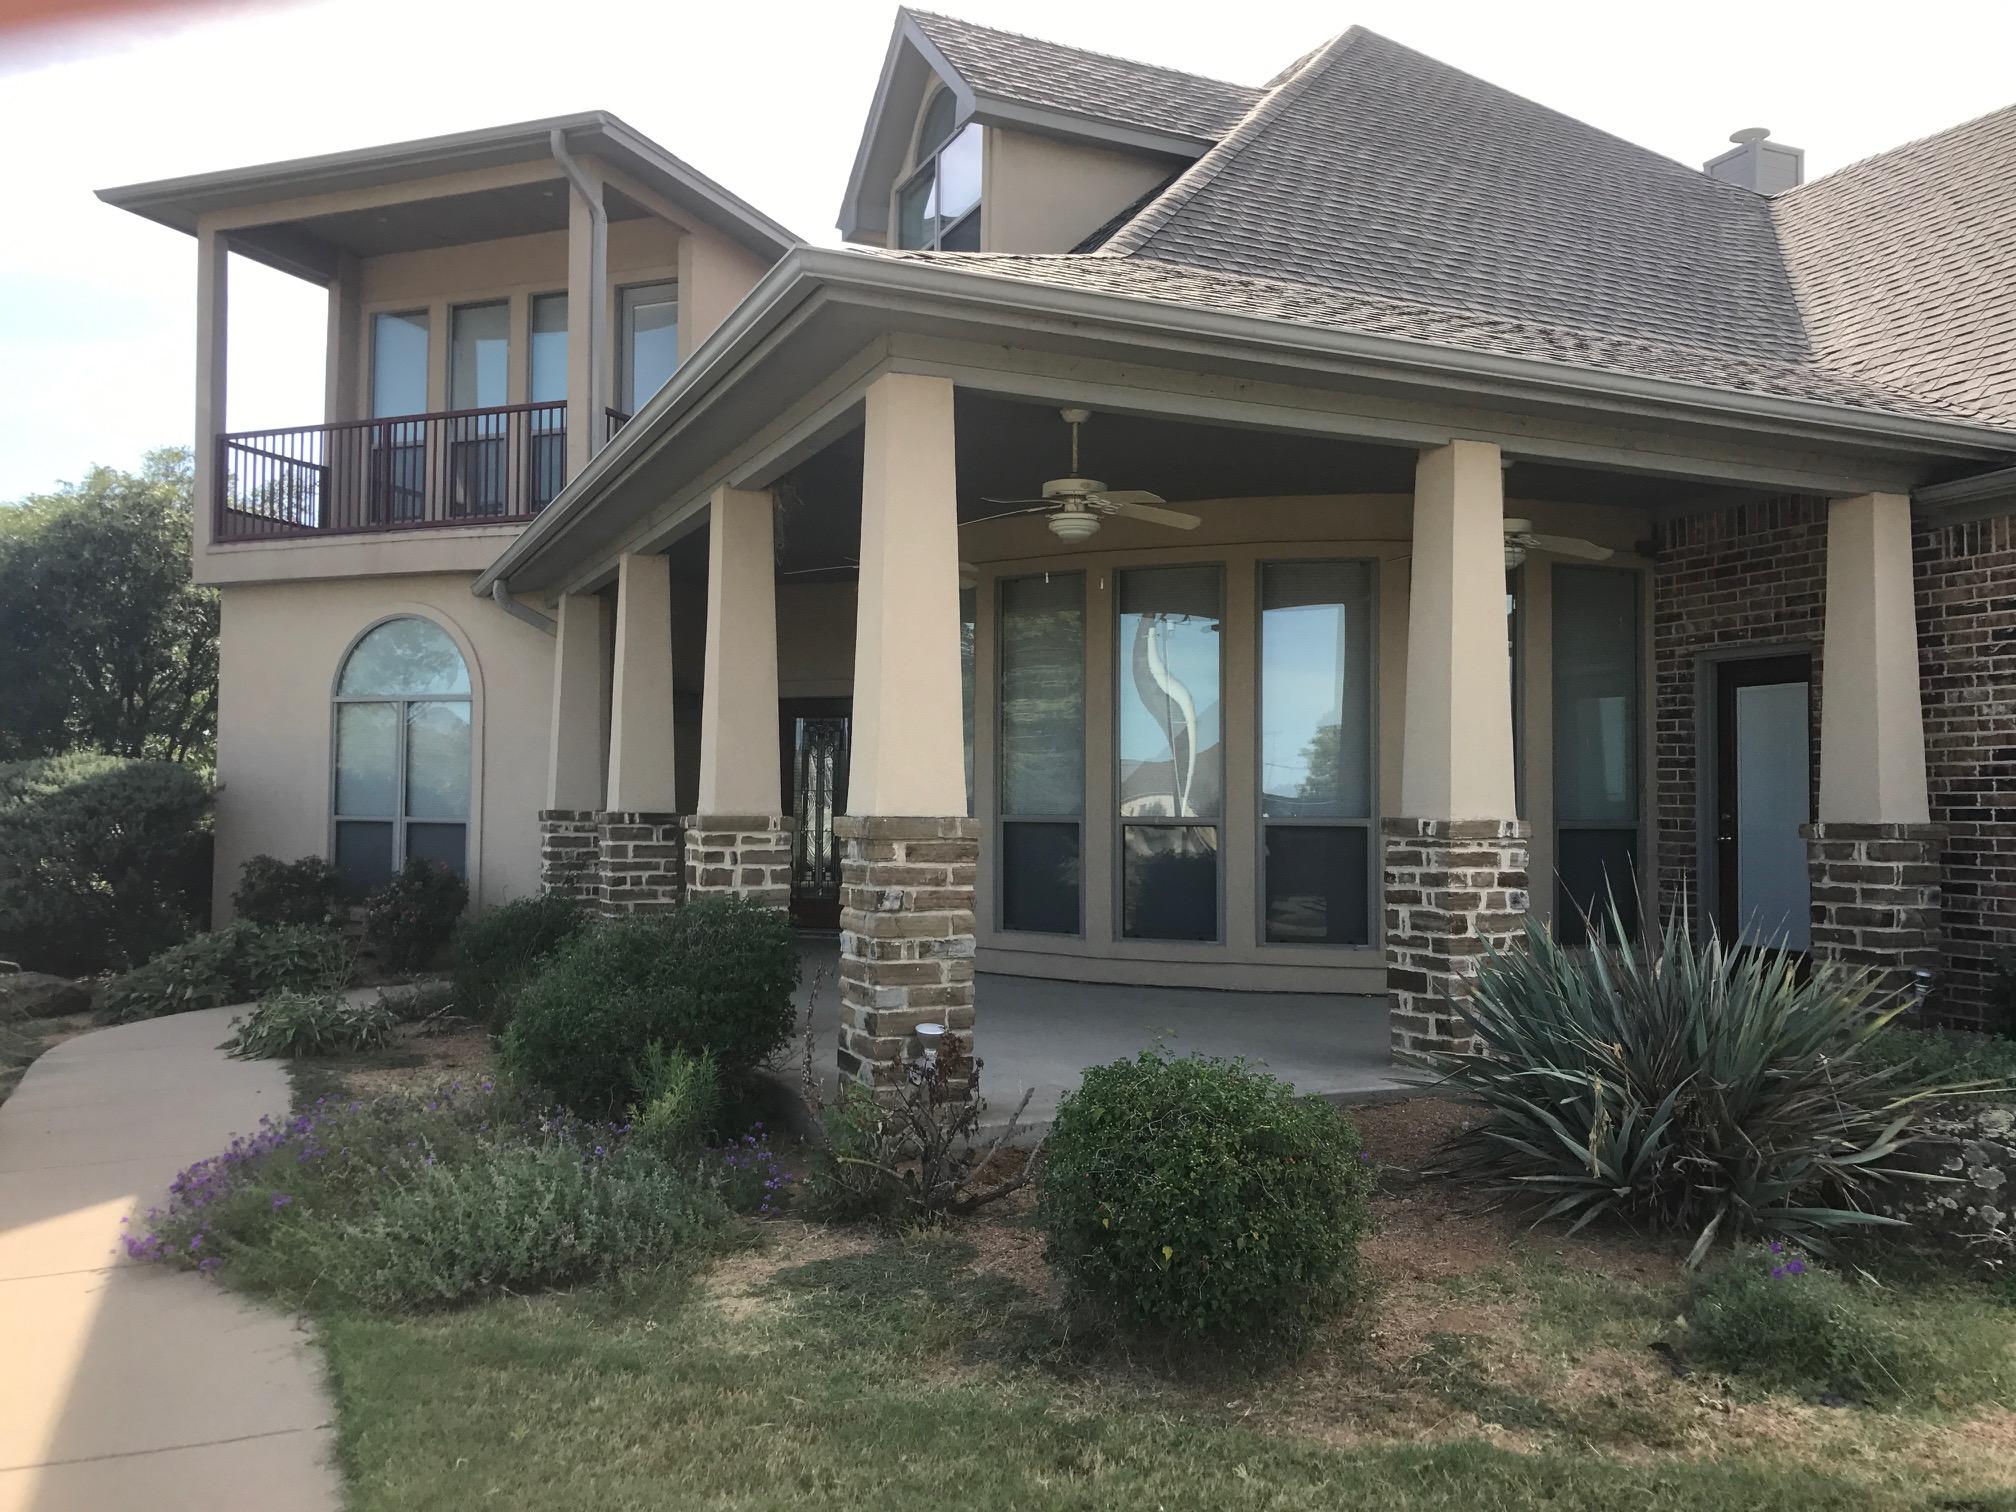 Photo of 108 Lakeshore Drive, Waxahachie, TX 75165